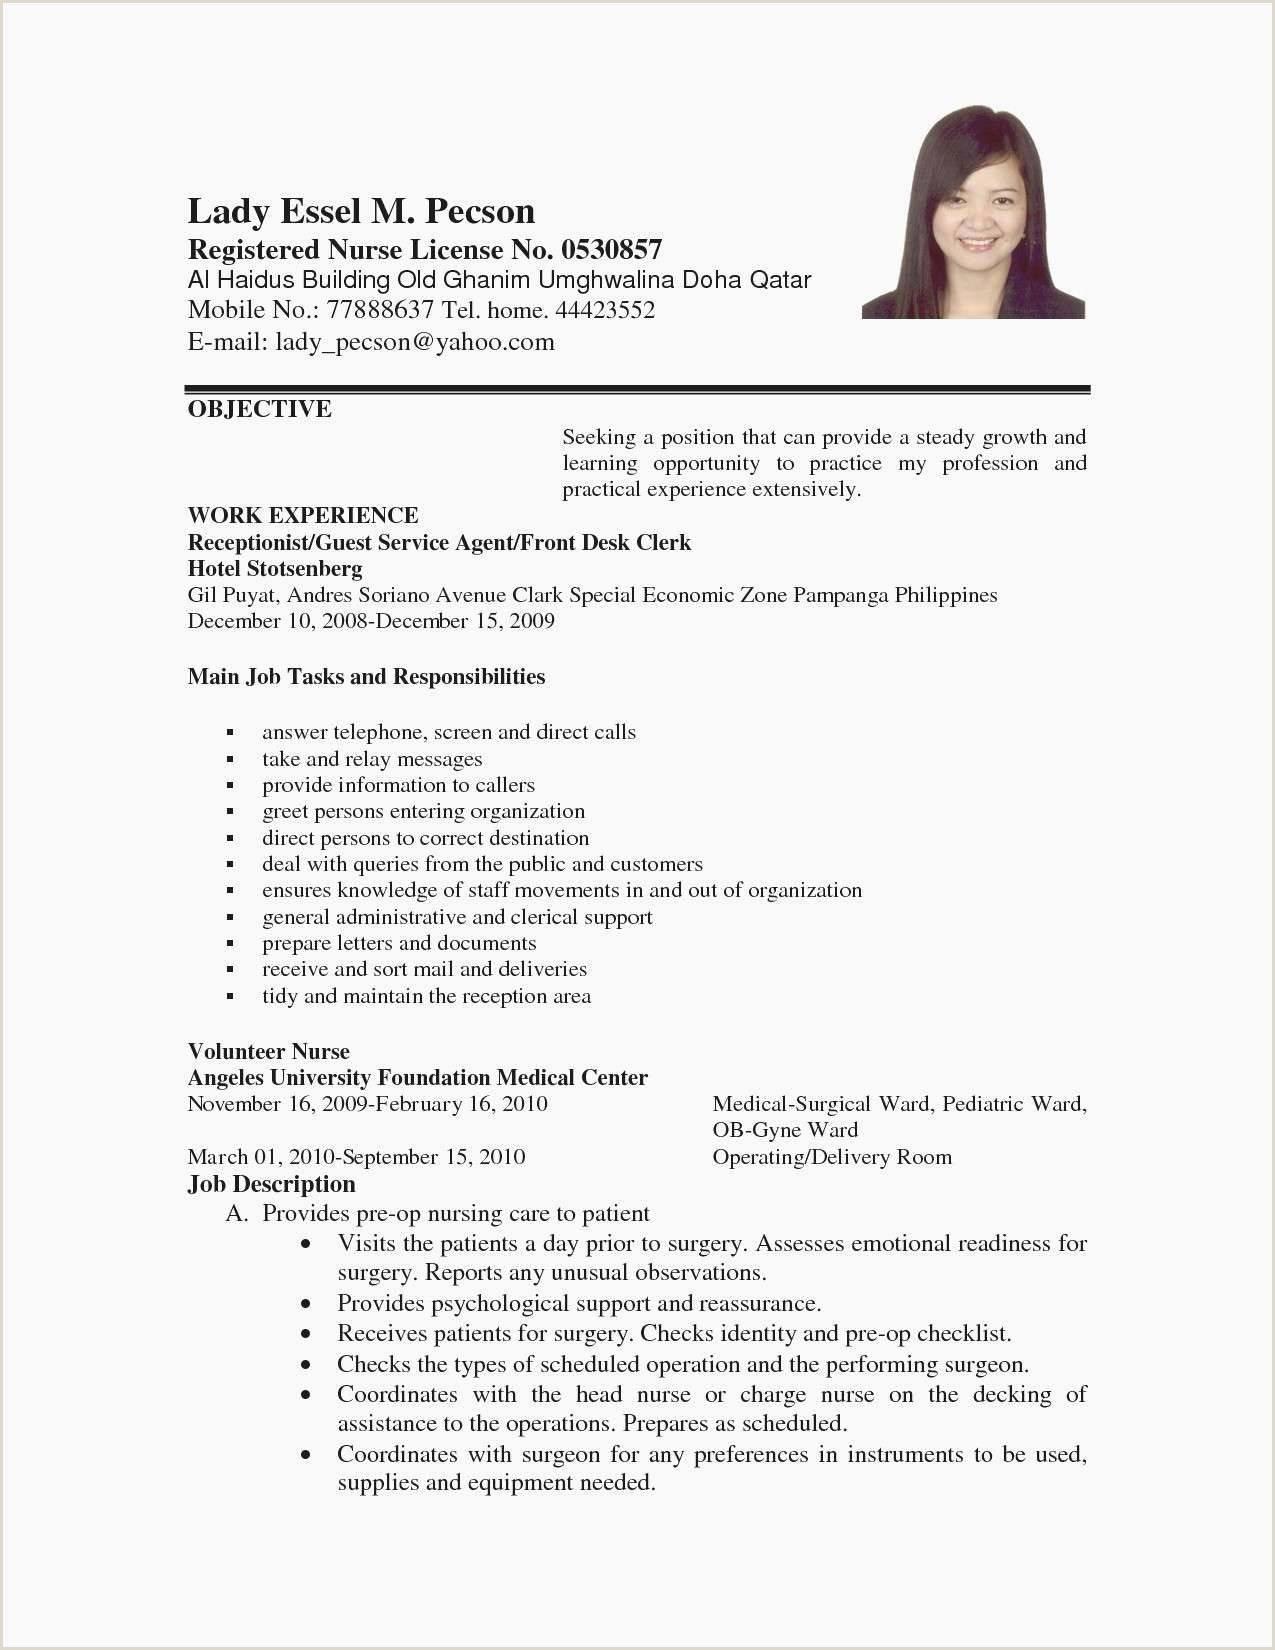 Resume format for No Job Experience 41 Simple format De Cv Xenakisworld